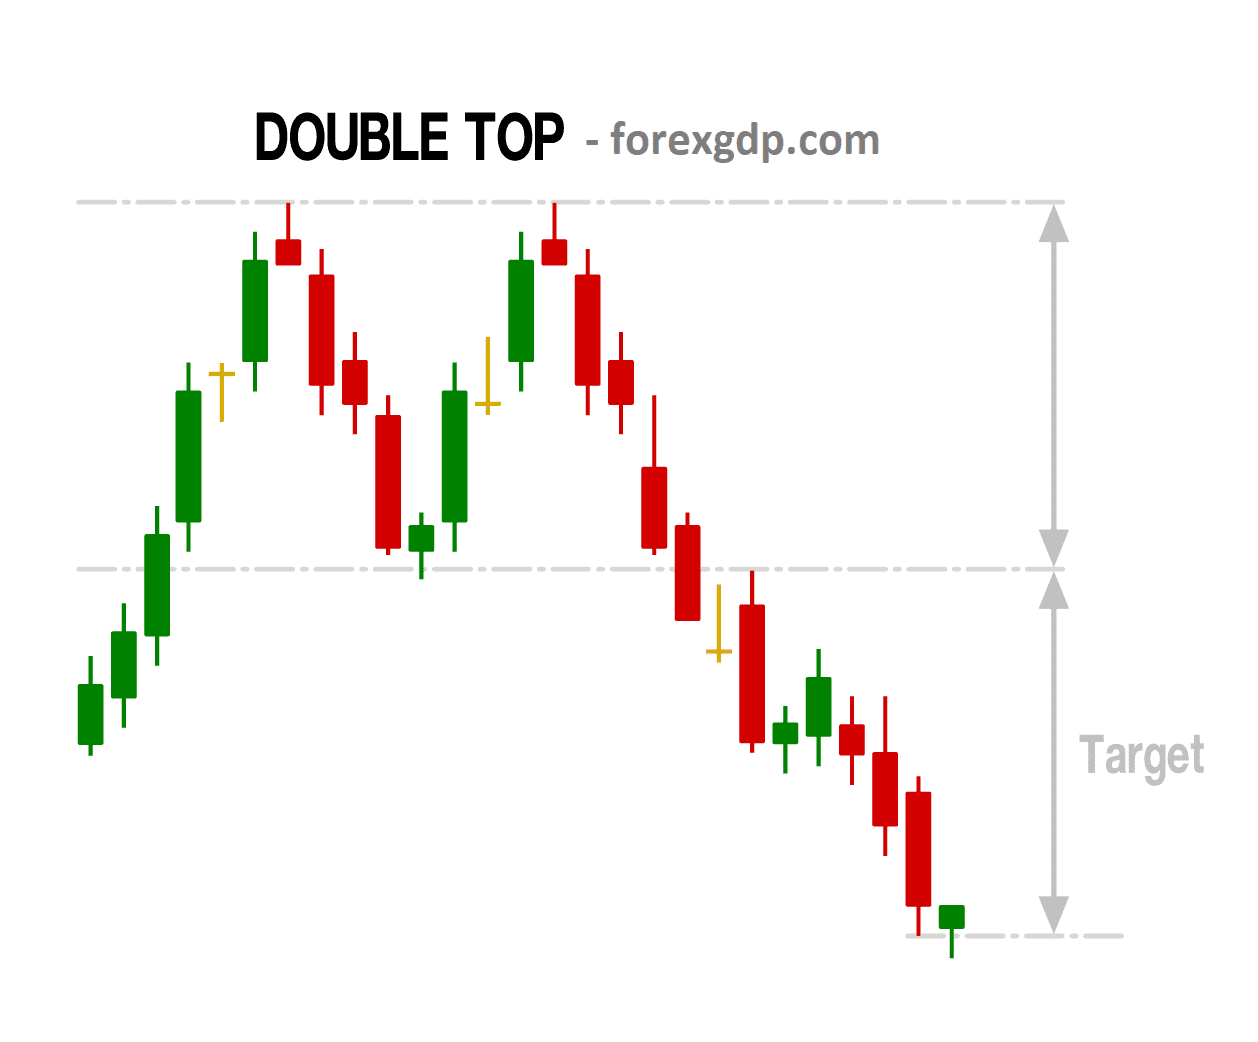 Double Top take profit target